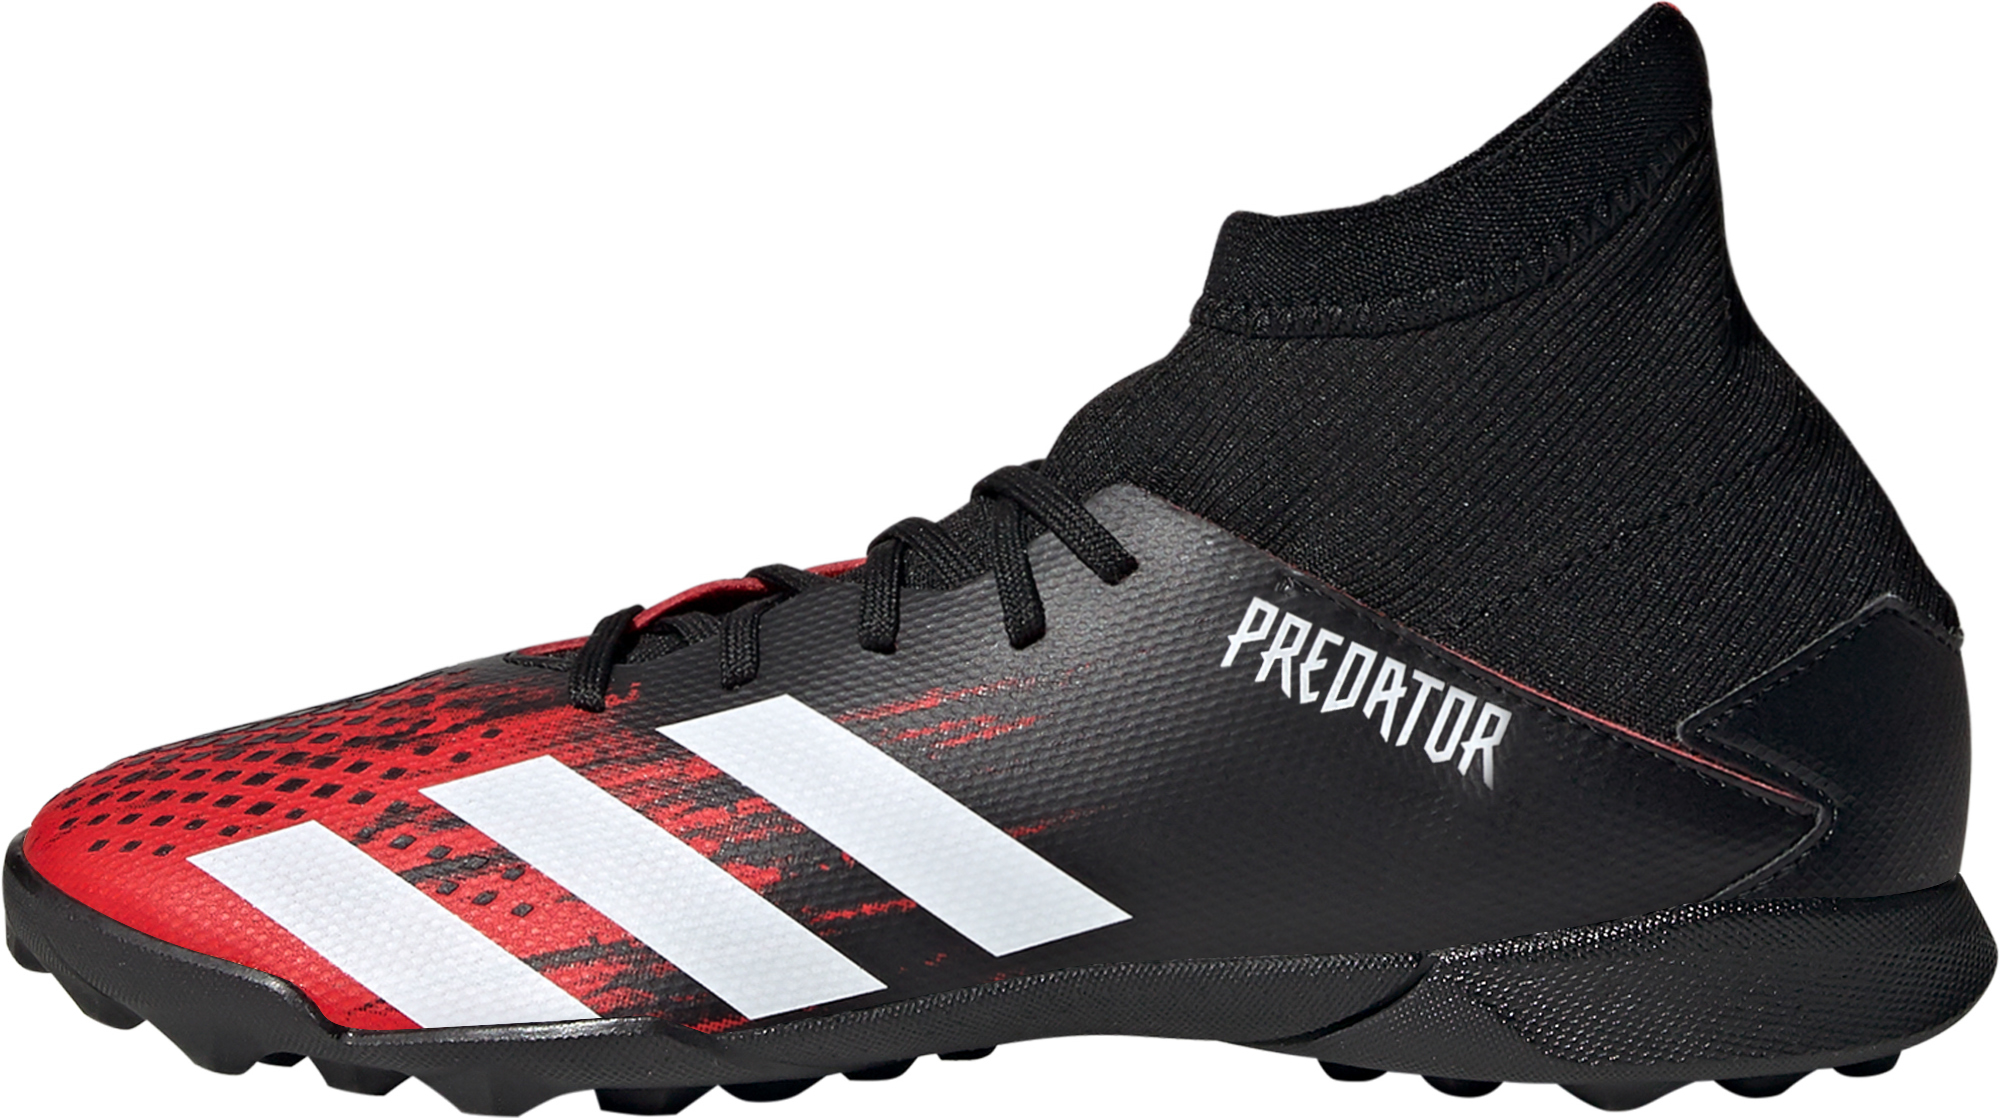 Adidas Бутсы для мальчиков adidas Predator 20.3 TF, размер 36 цена 2017